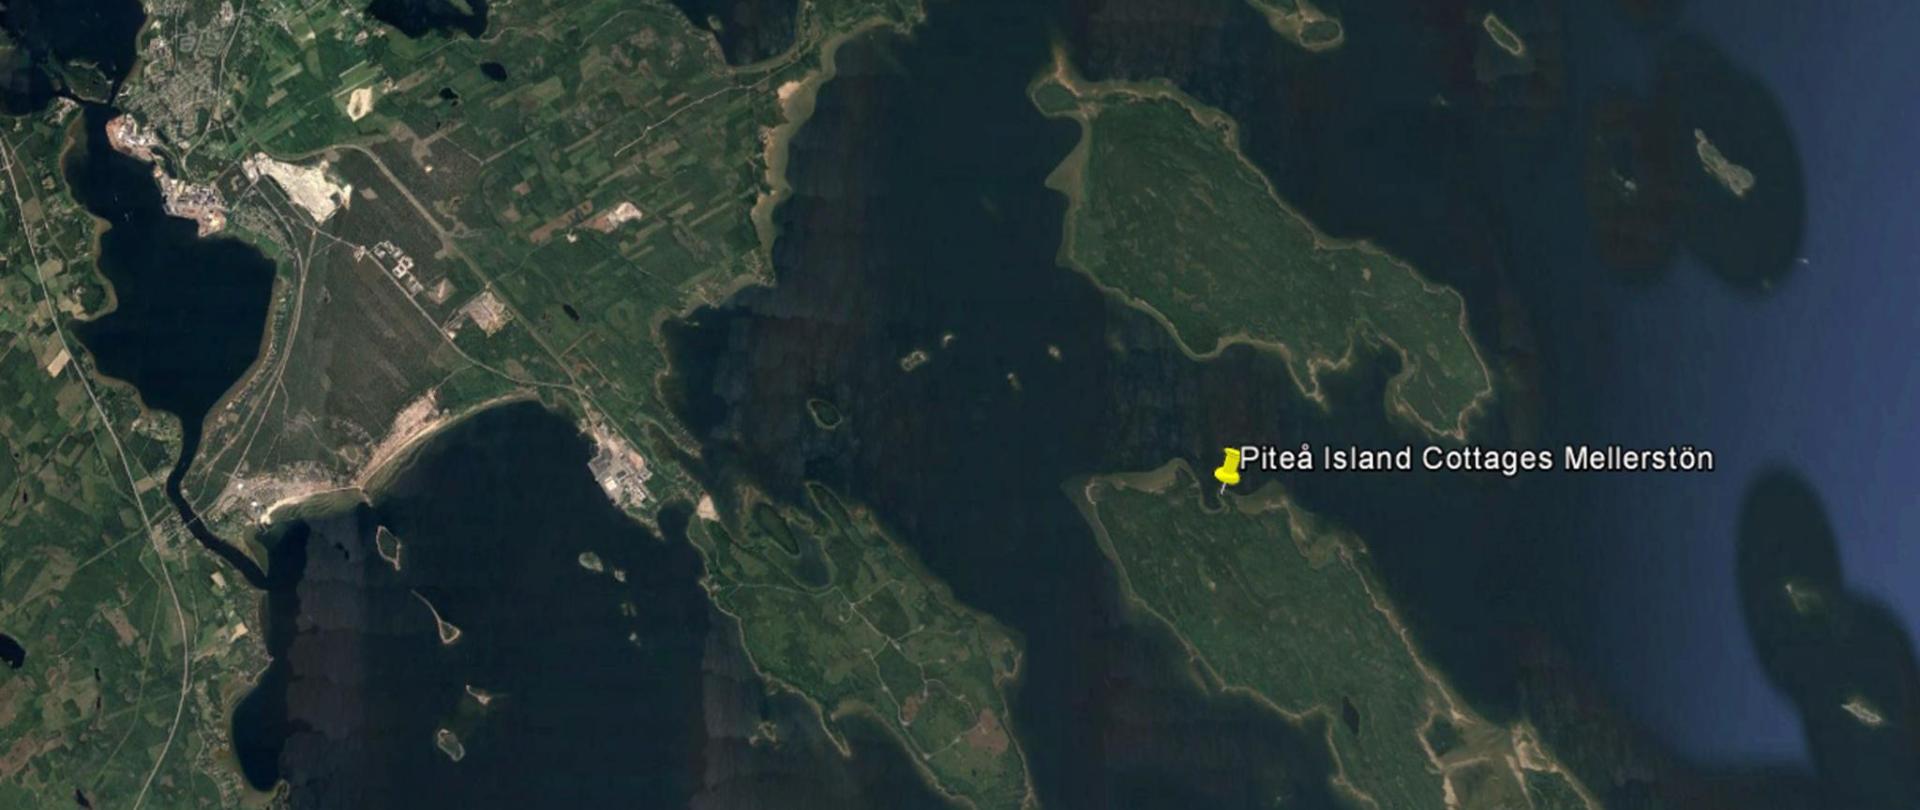 Piteå Island Cottage Mellerstön.jpg